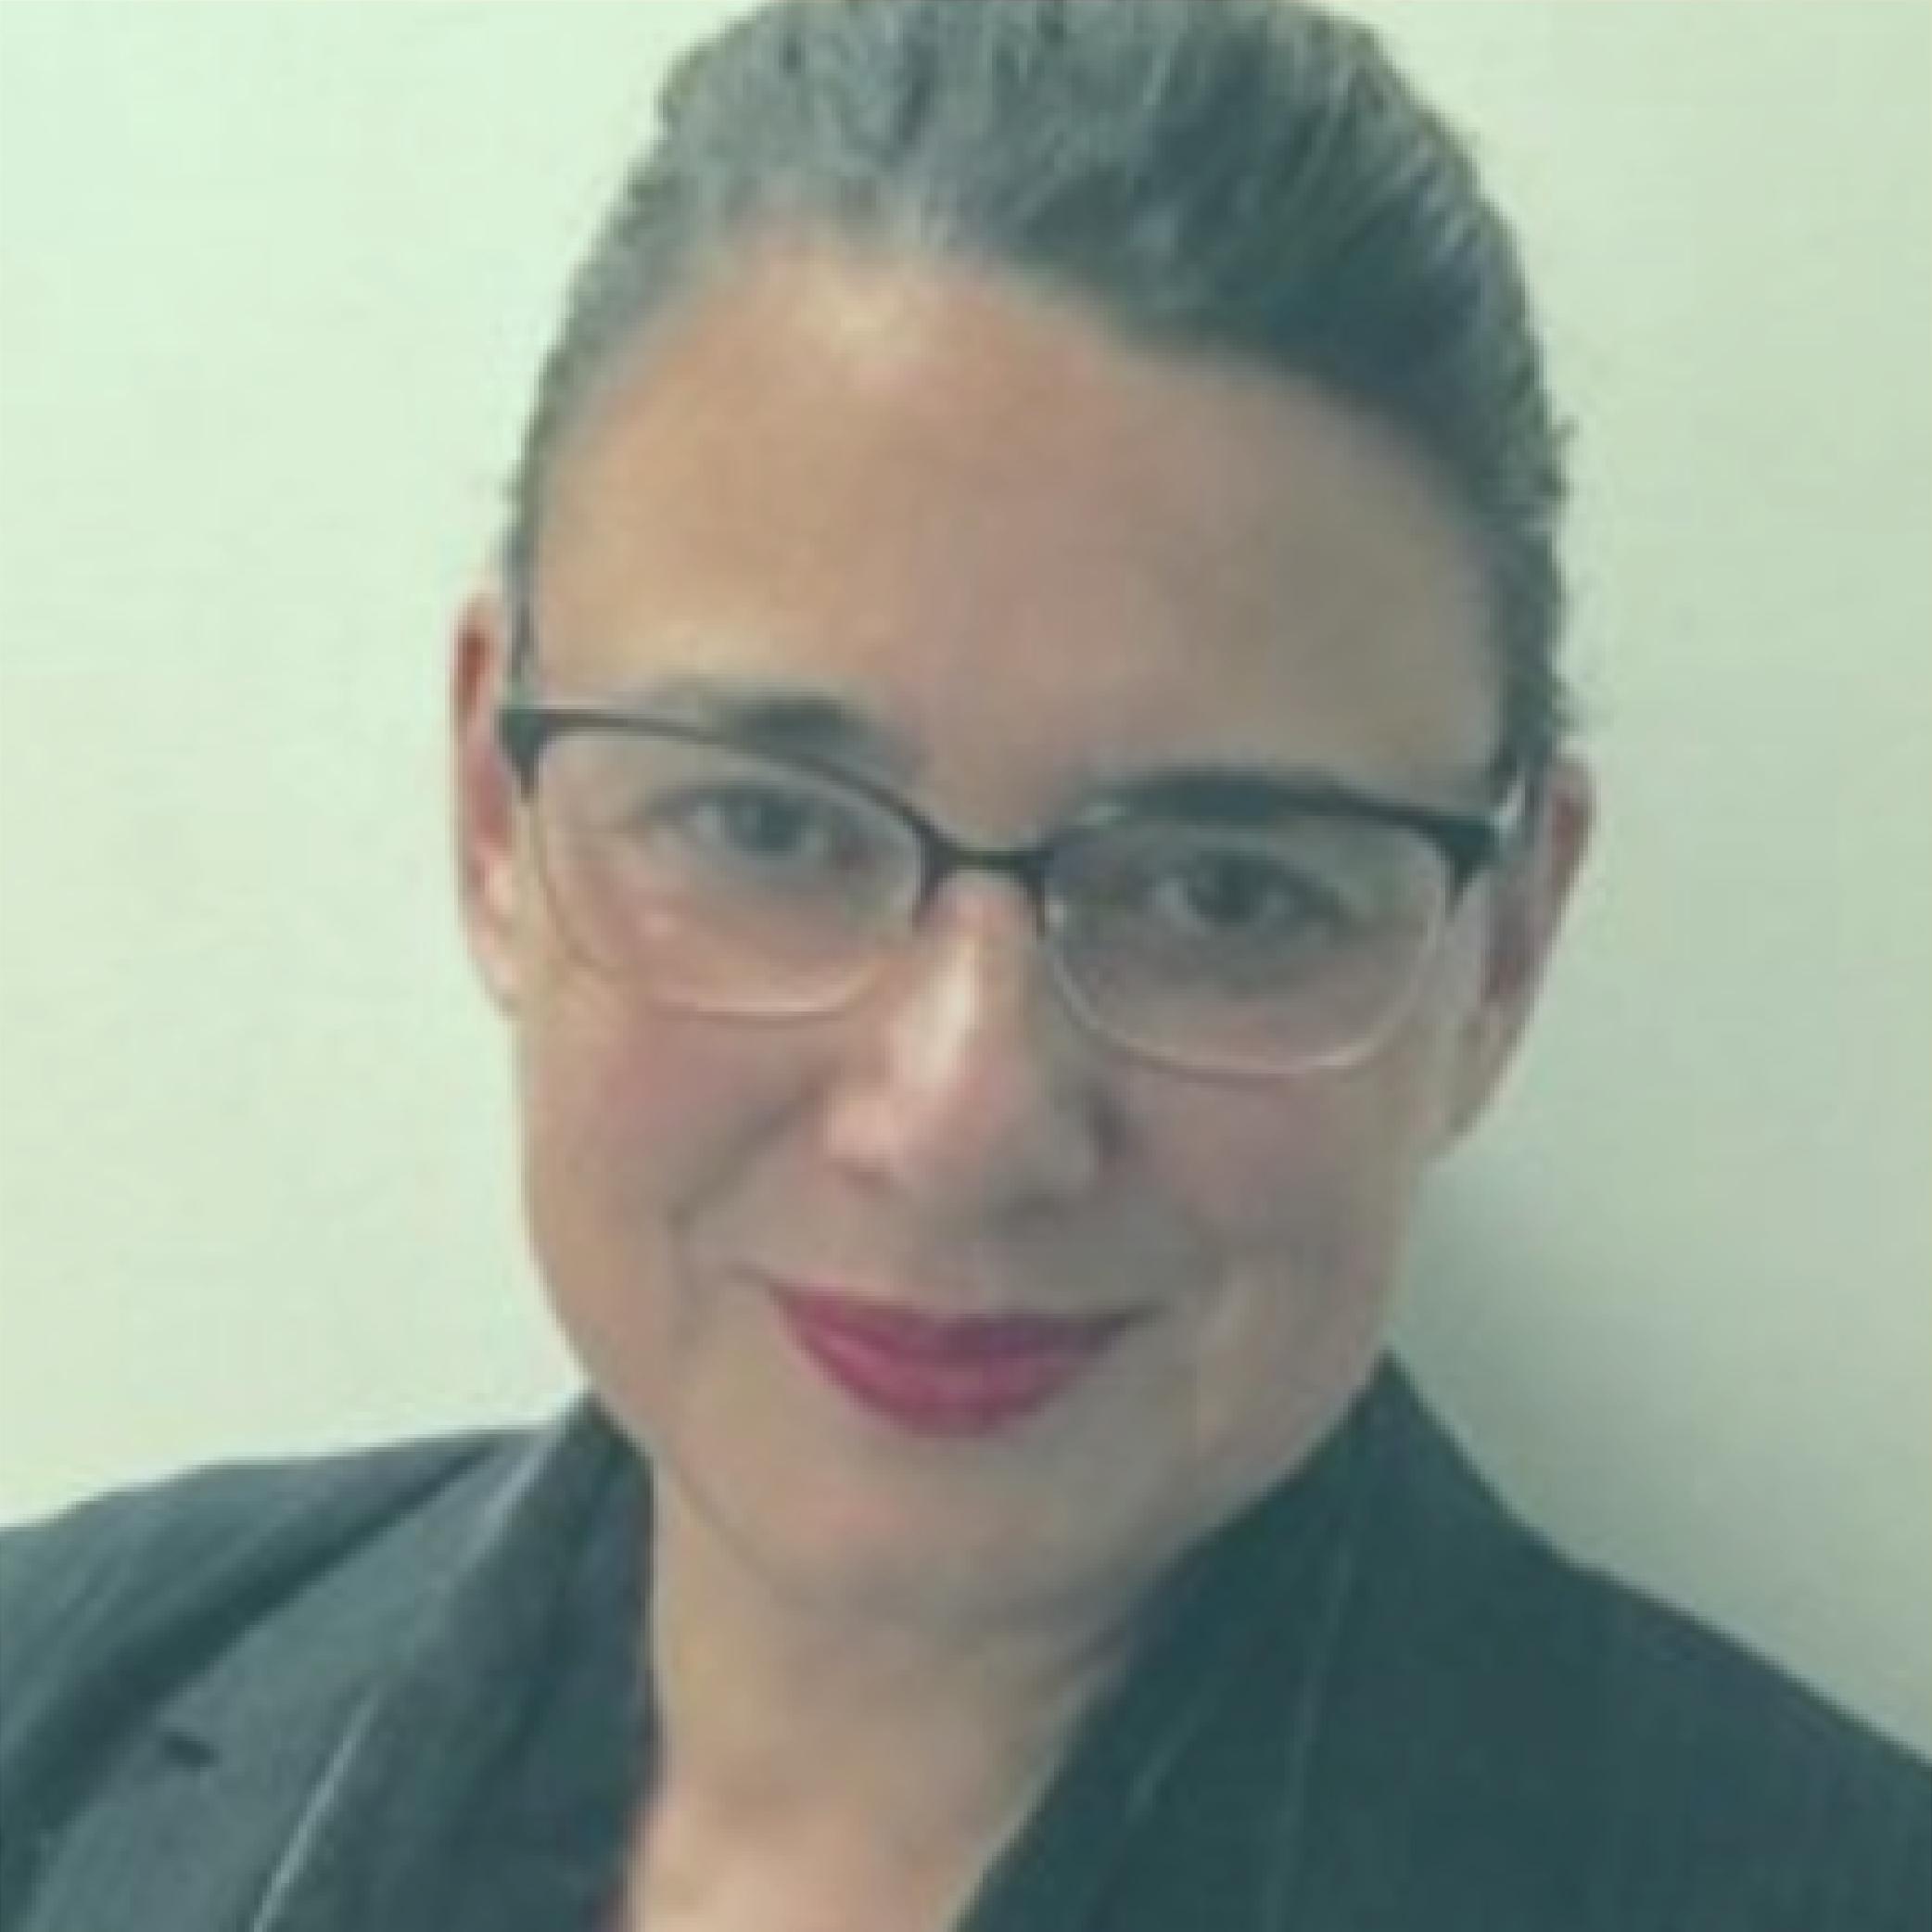 Carmen Phillips - Leadership & Purpose11 July 2018